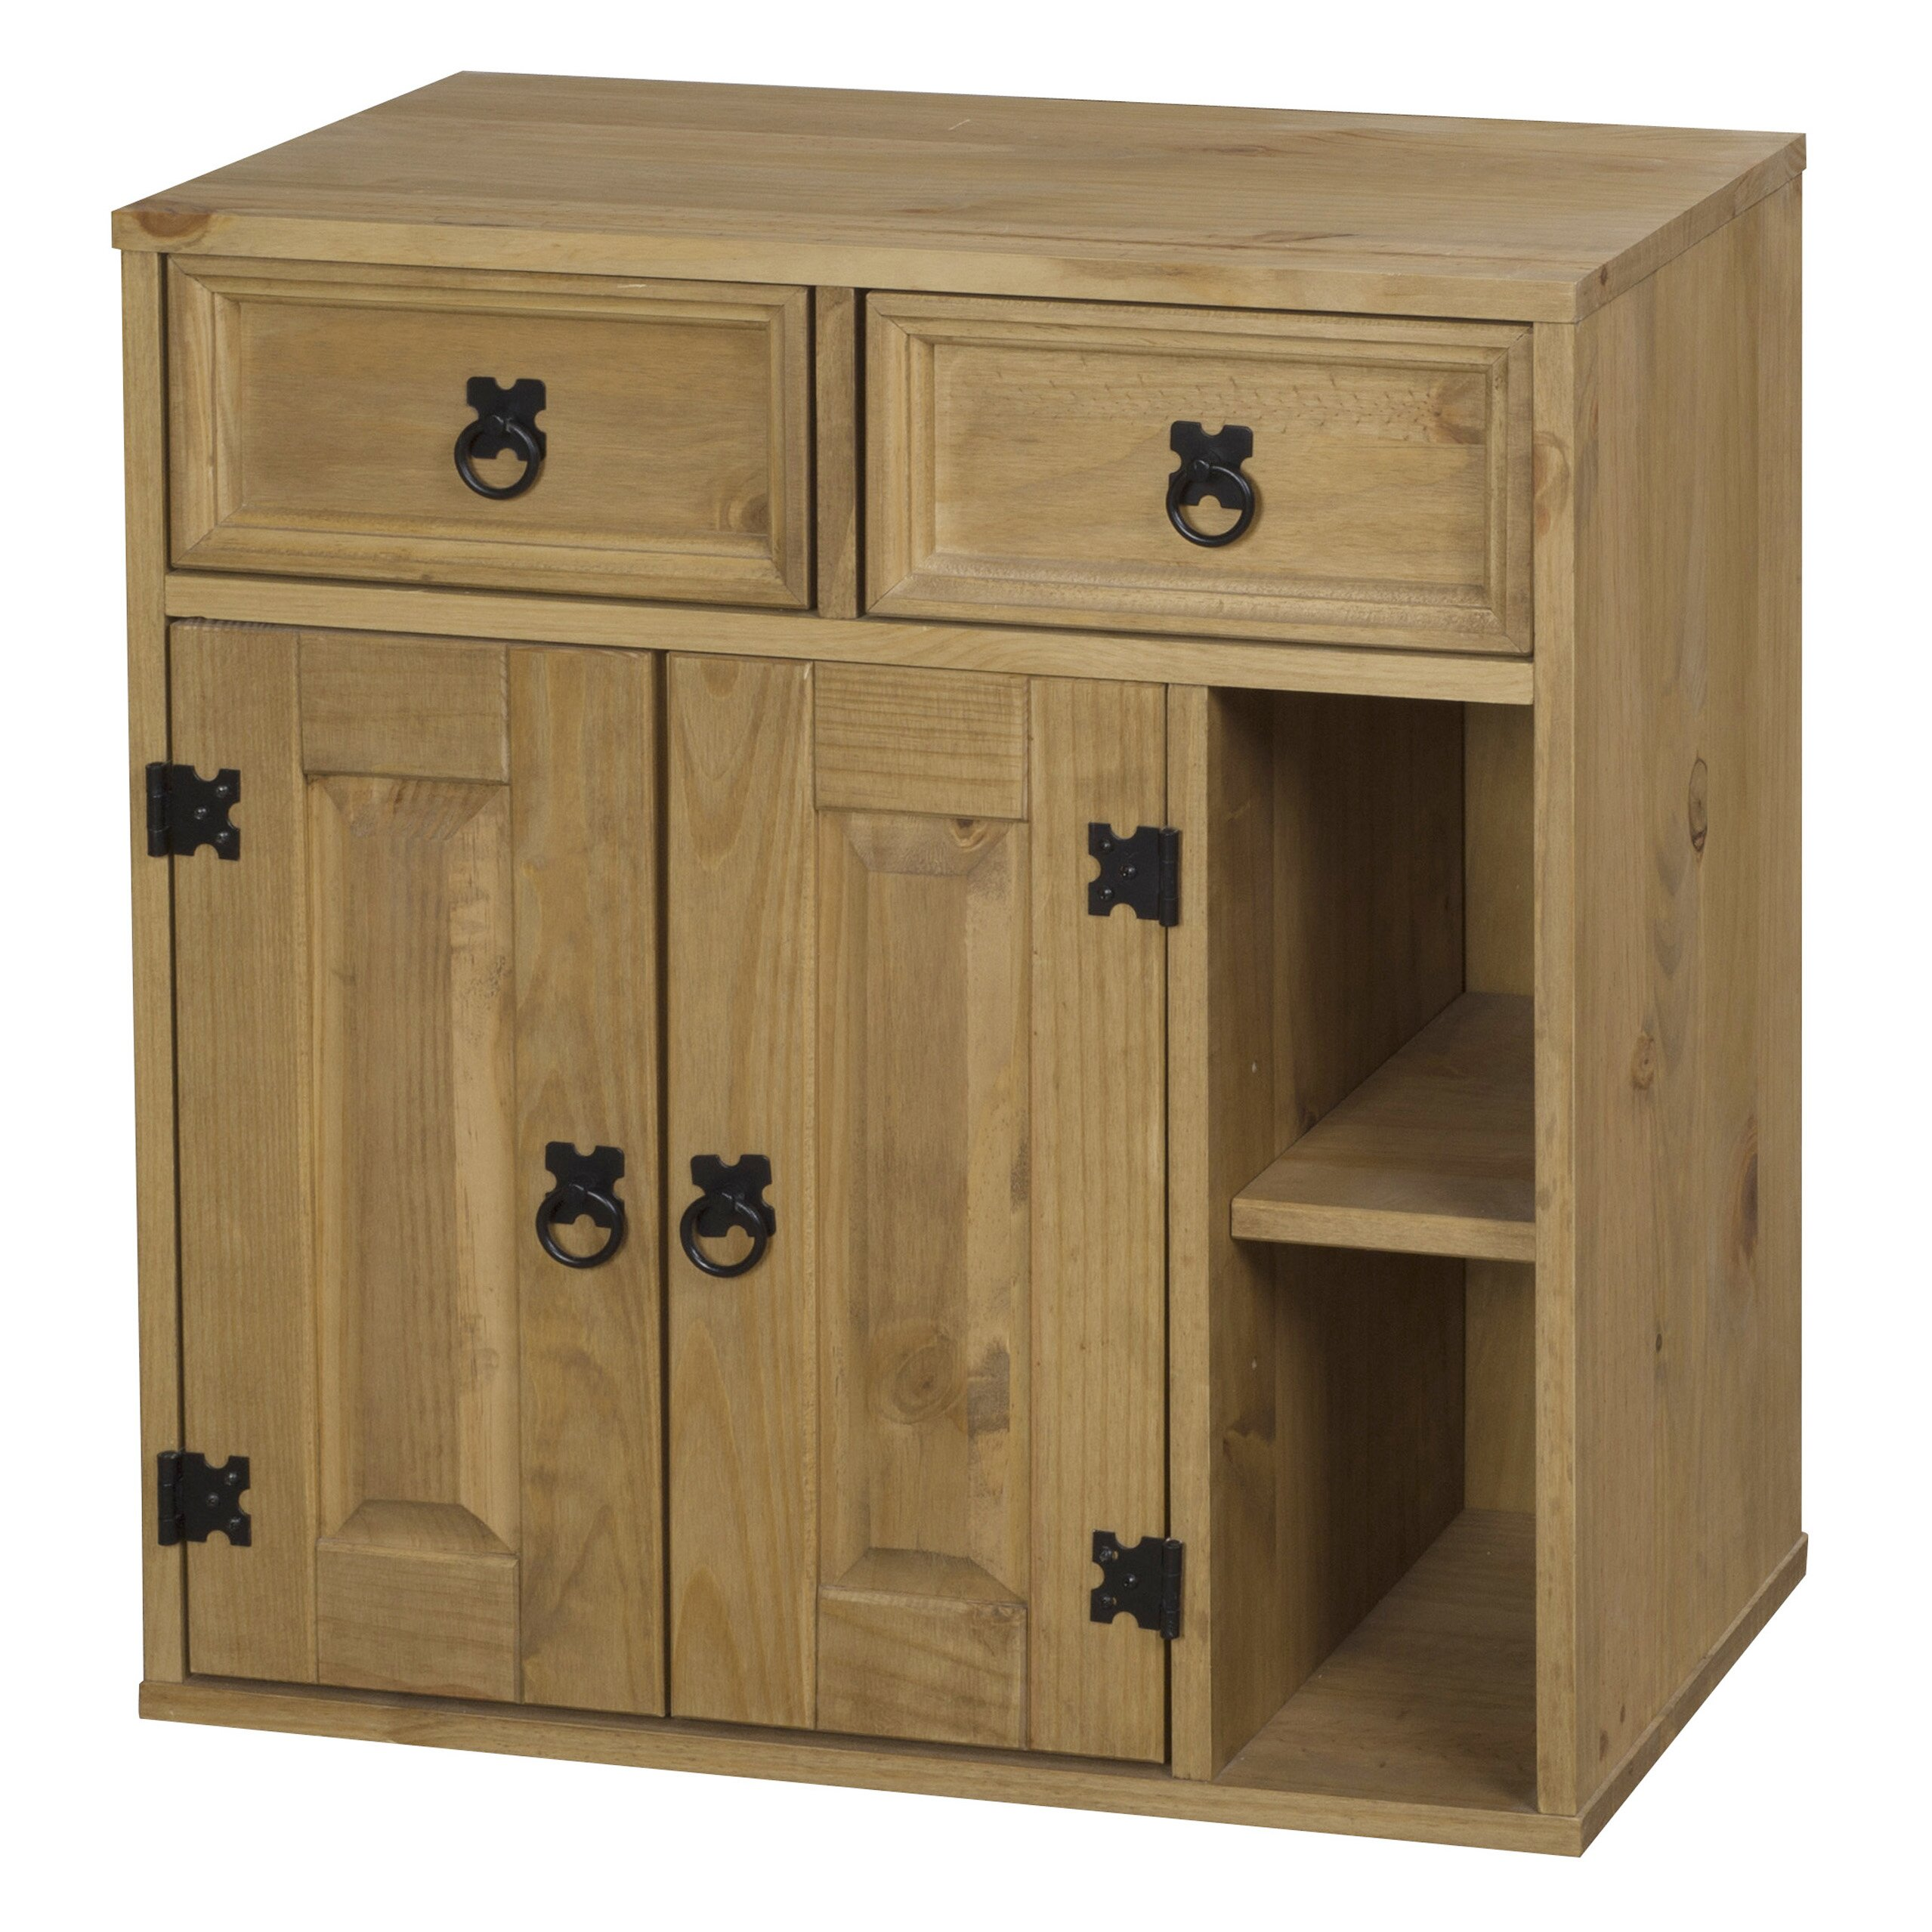 heartlands rustic corona multimedia cabinet reviews. Black Bedroom Furniture Sets. Home Design Ideas